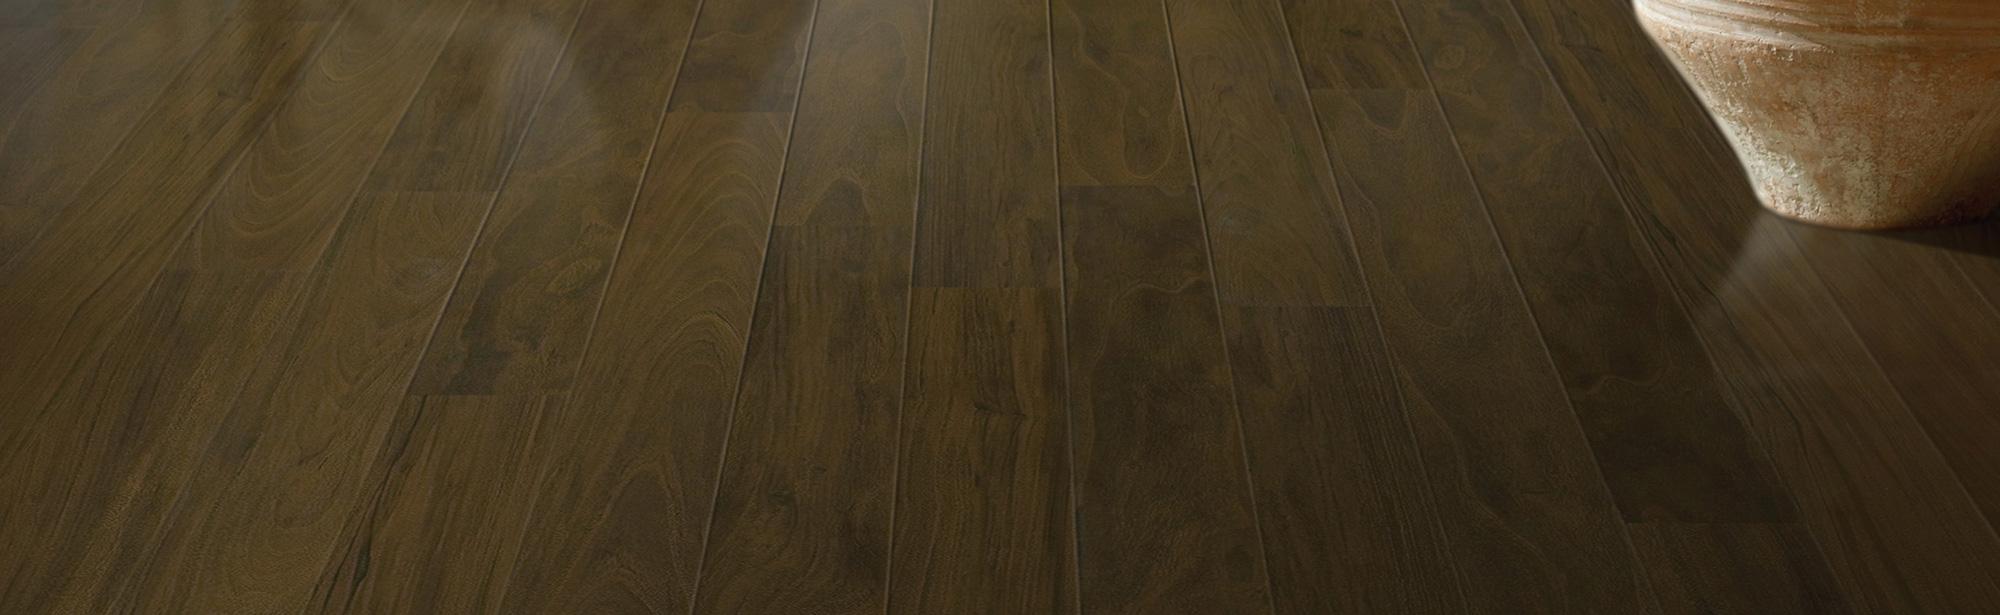 Empire flooring reviews simple empire flooring cost for Dupont laminate flooring